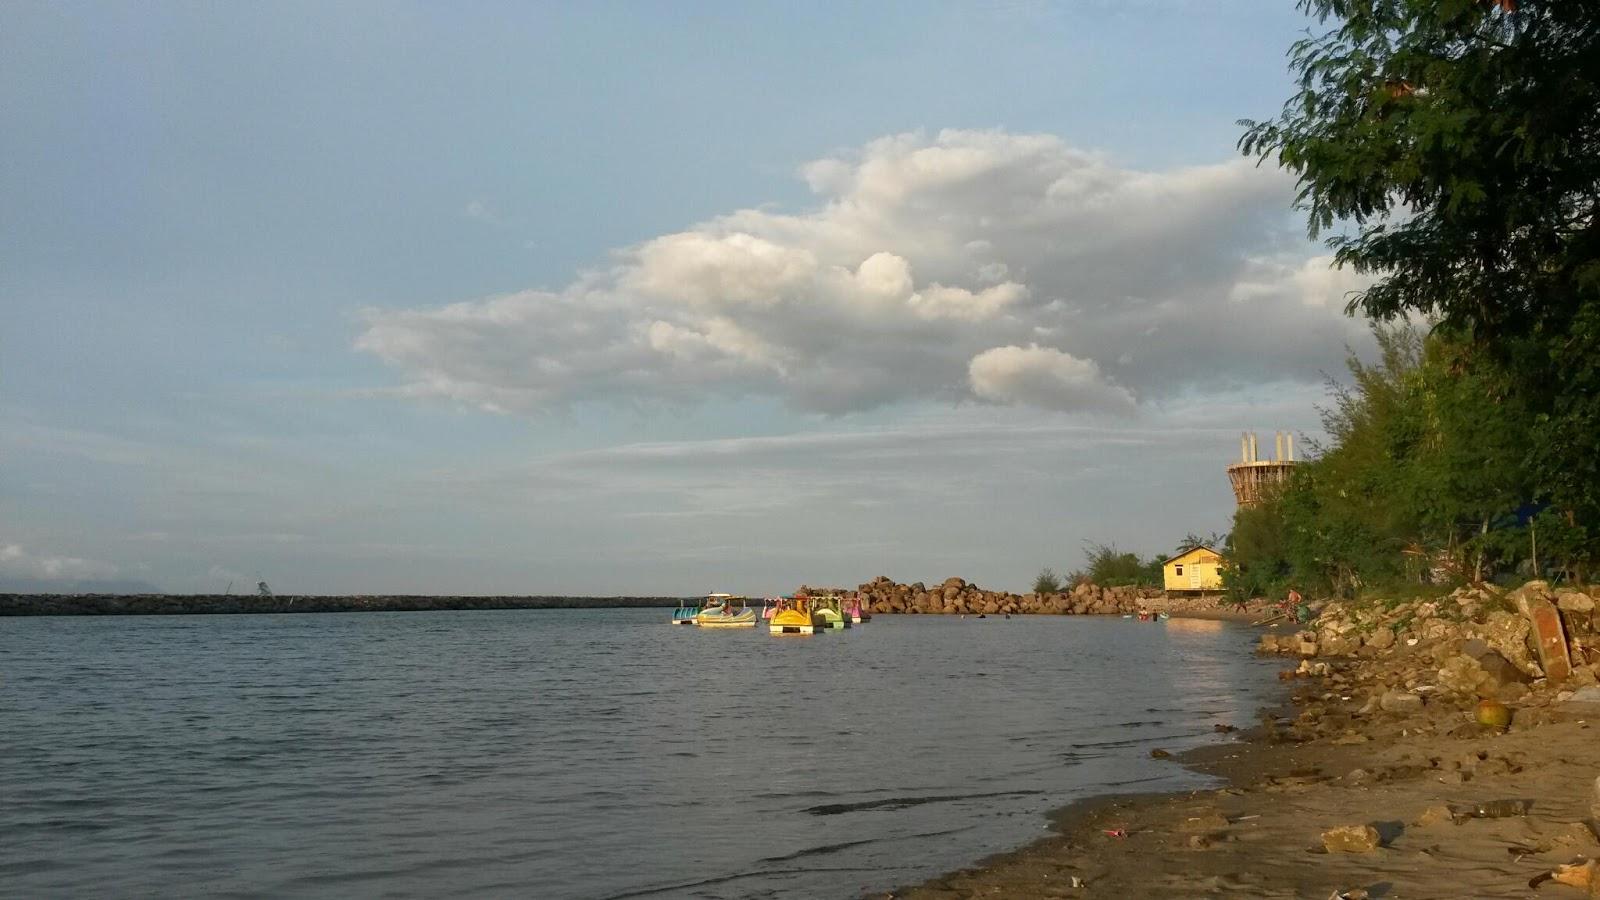 Wisata Ke Pantai Ulee Lheu